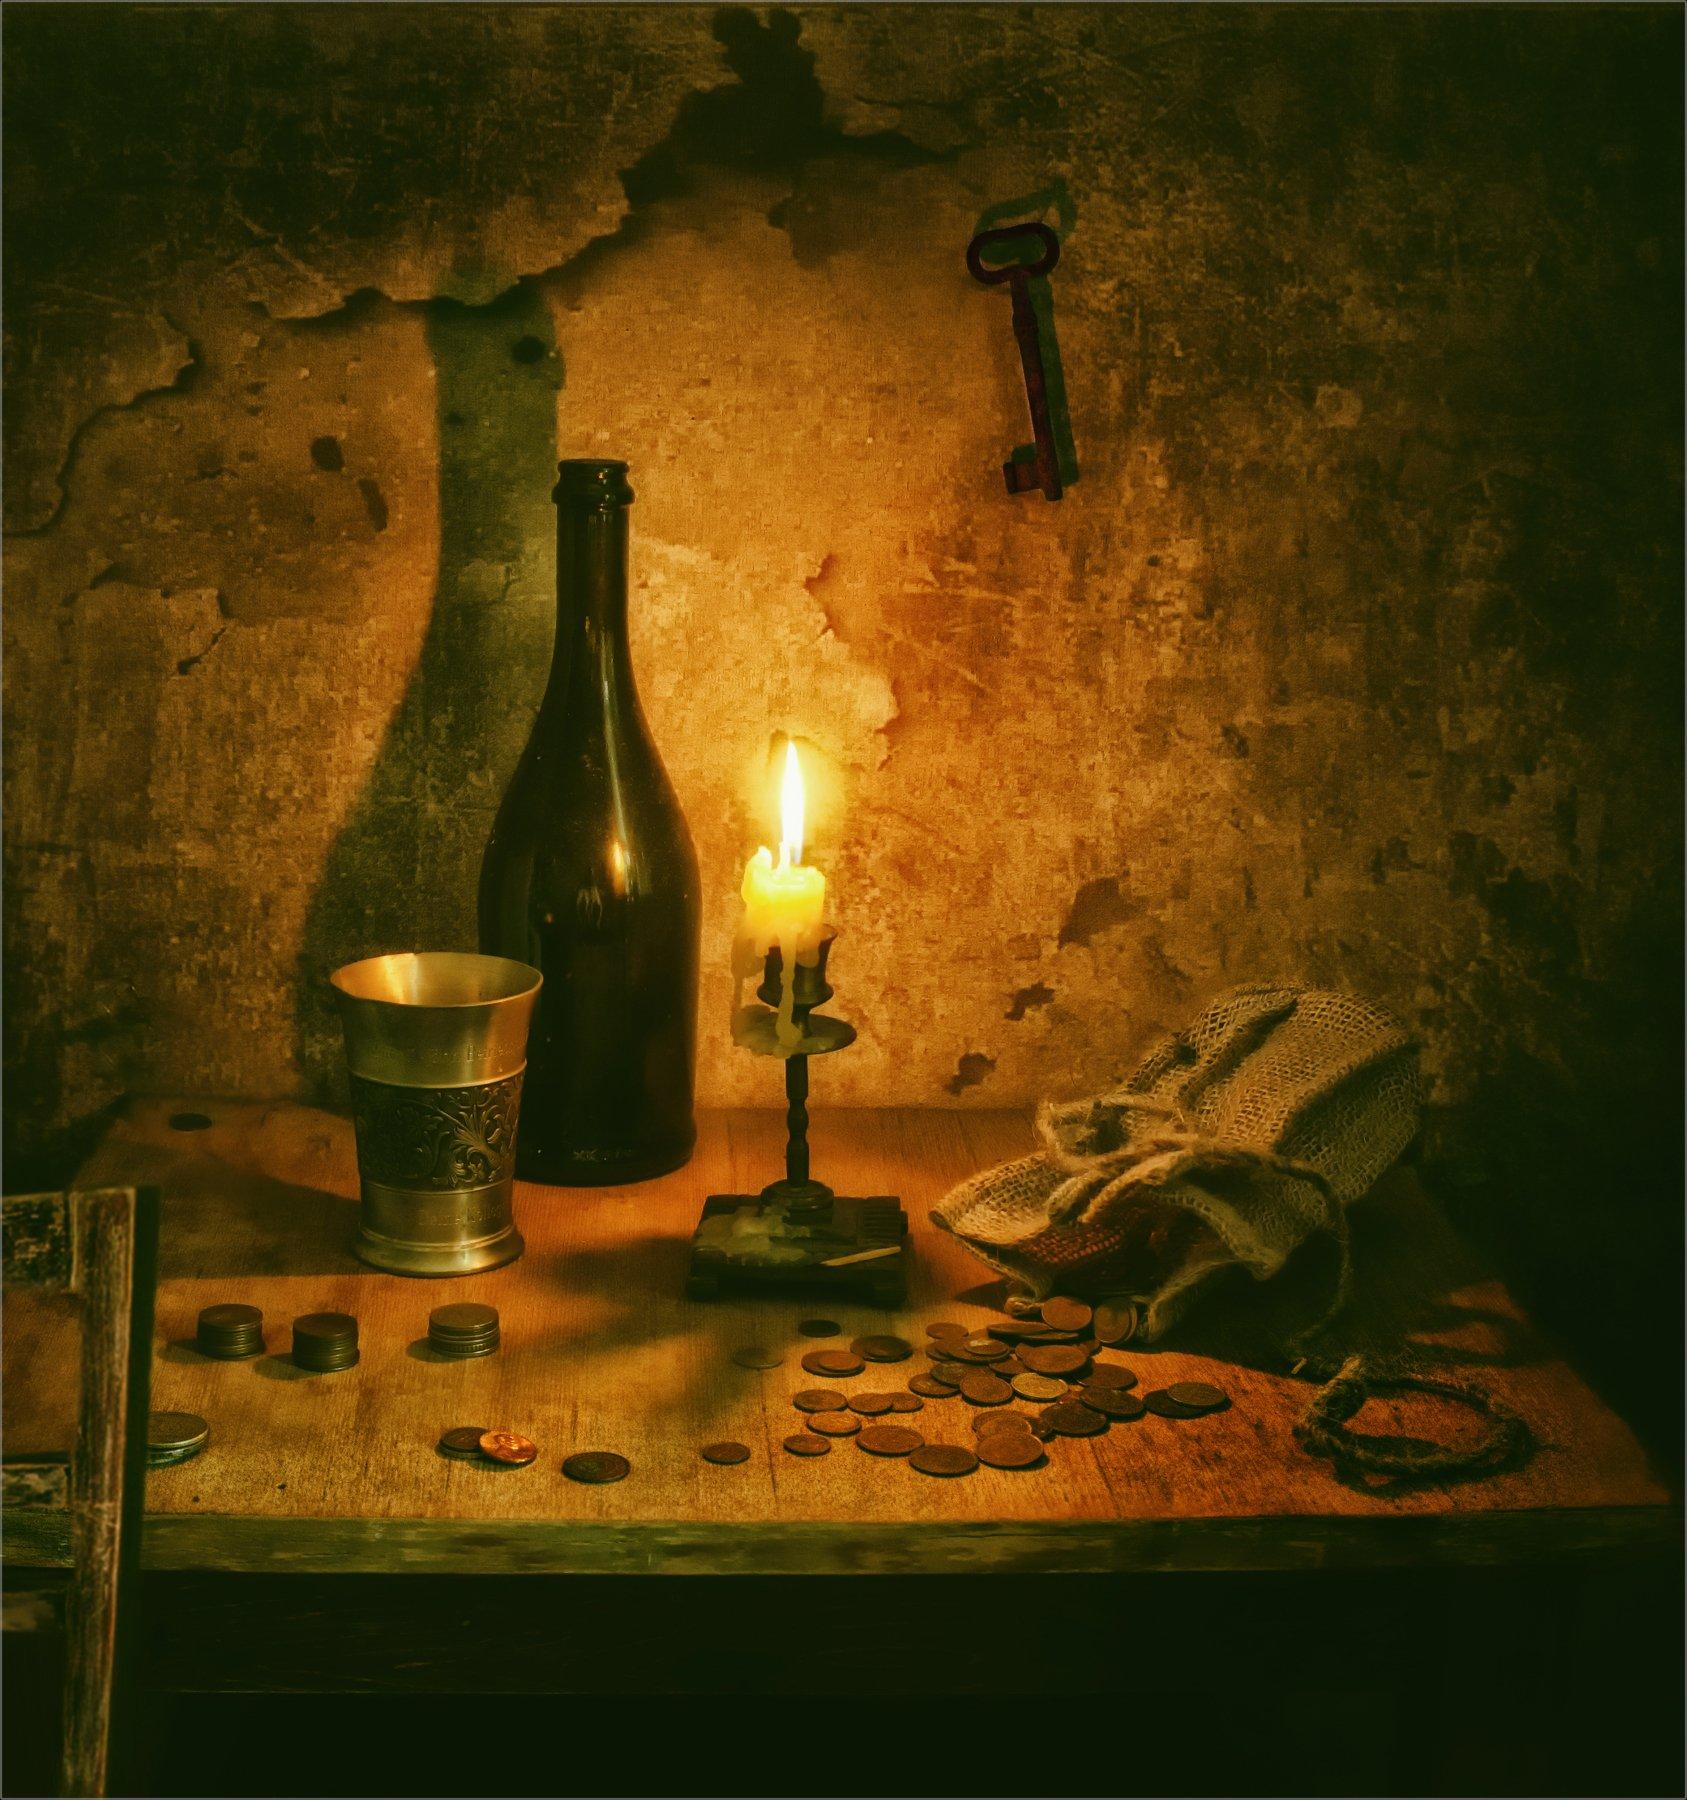 still life, натюрморт,  винтаж, ретро, свеча, огонь, деньги, монеты, свет , тень, бутылка, стакан, напиток, ключ,, Михаил MSH